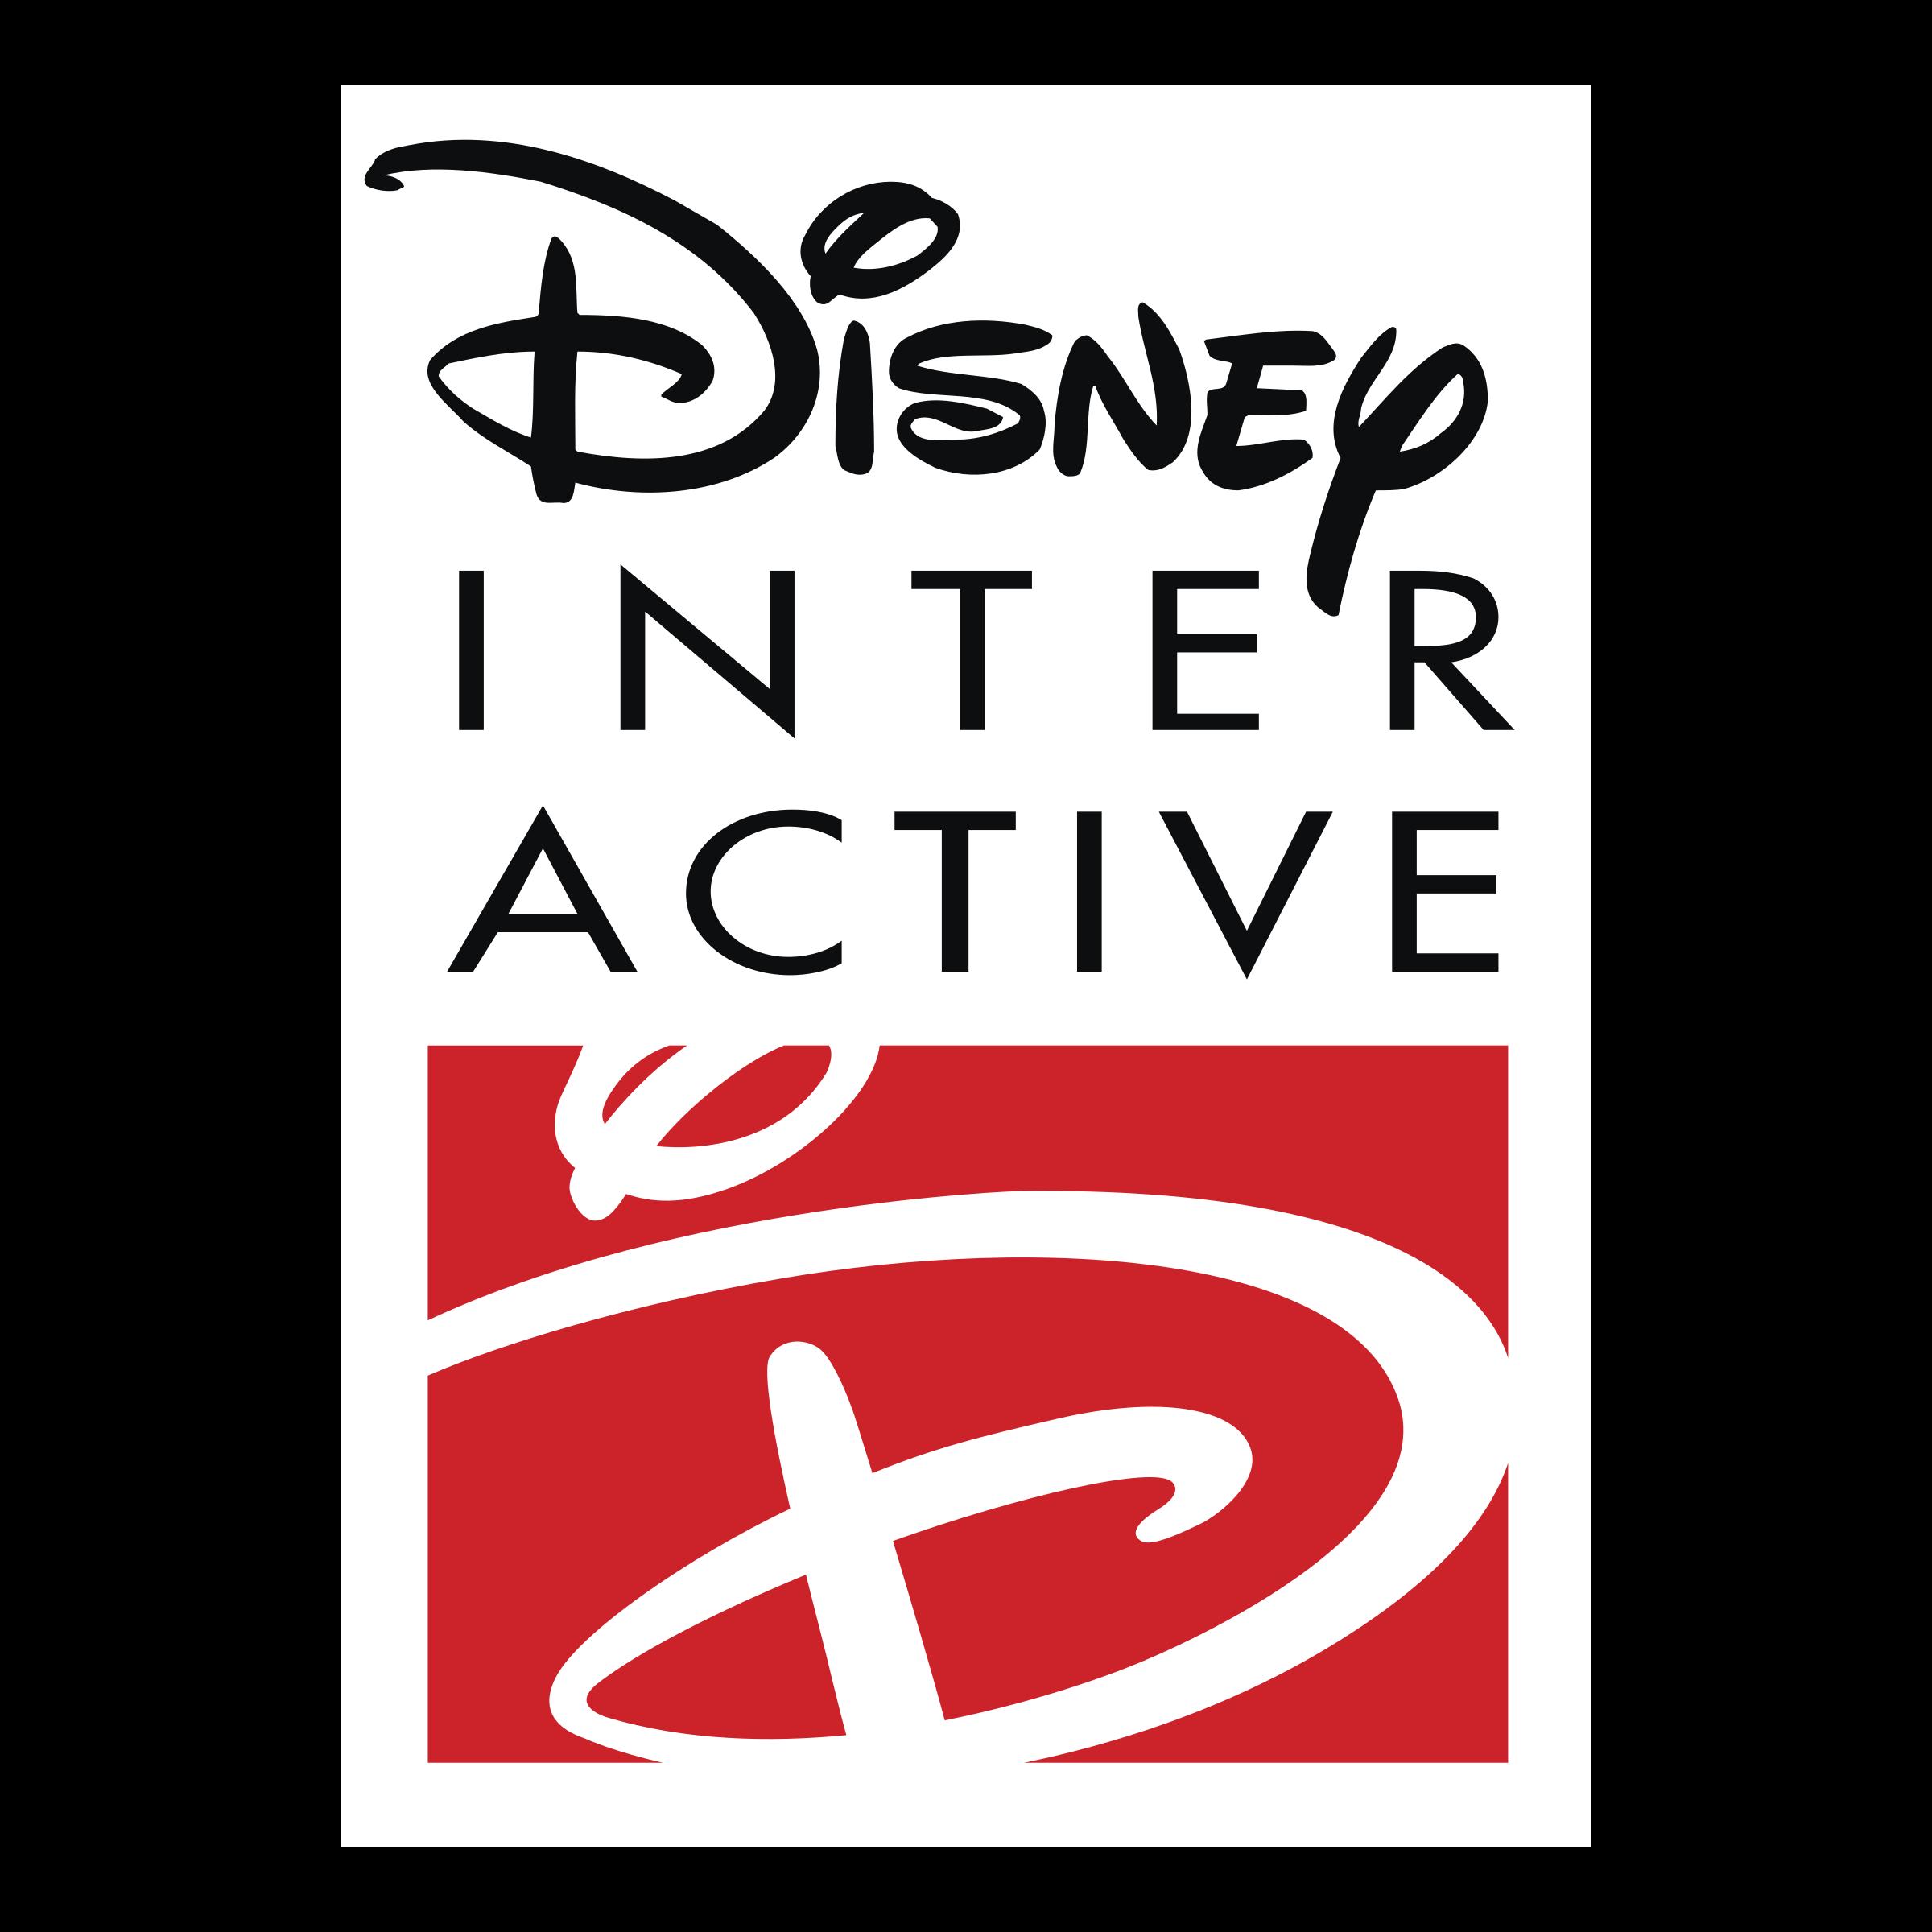 Disney Interactive Logo PNG Transparent & SVG Vector ...